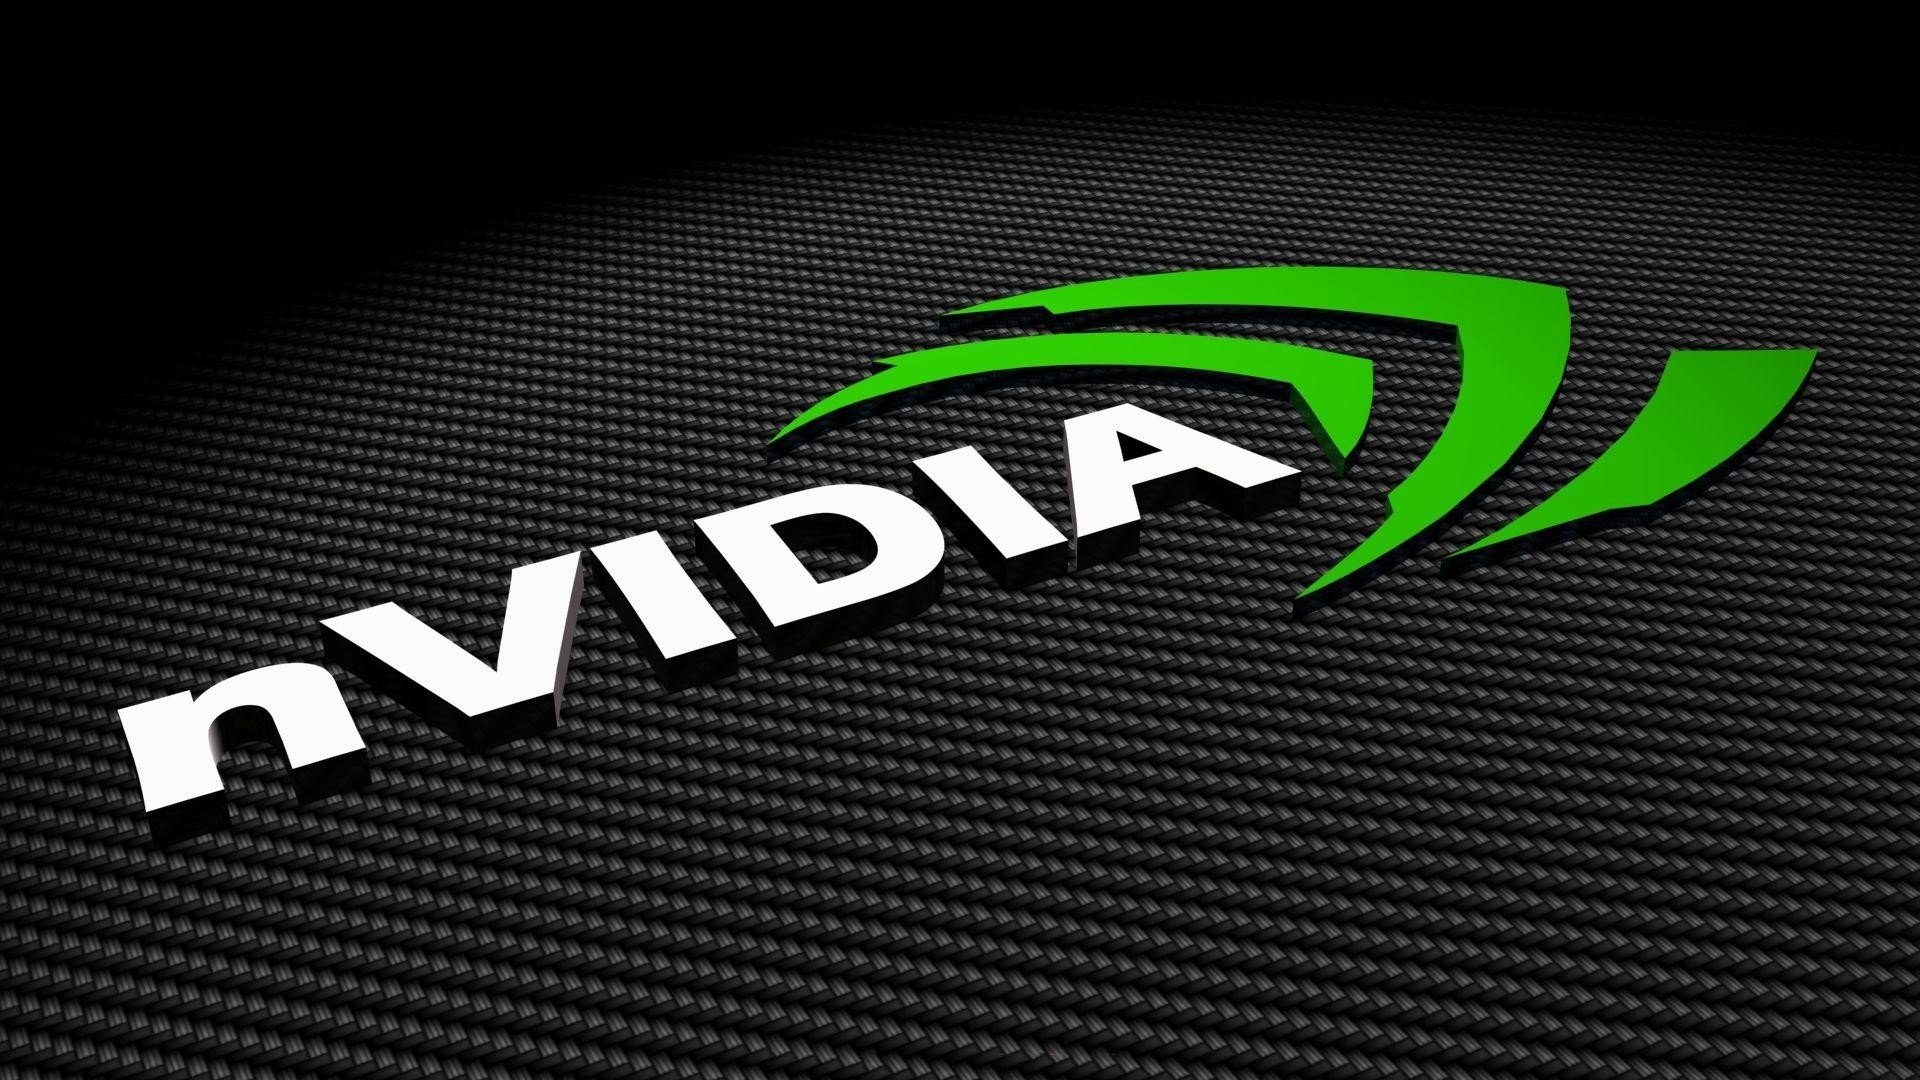 Nvidia Wallpaper image hd